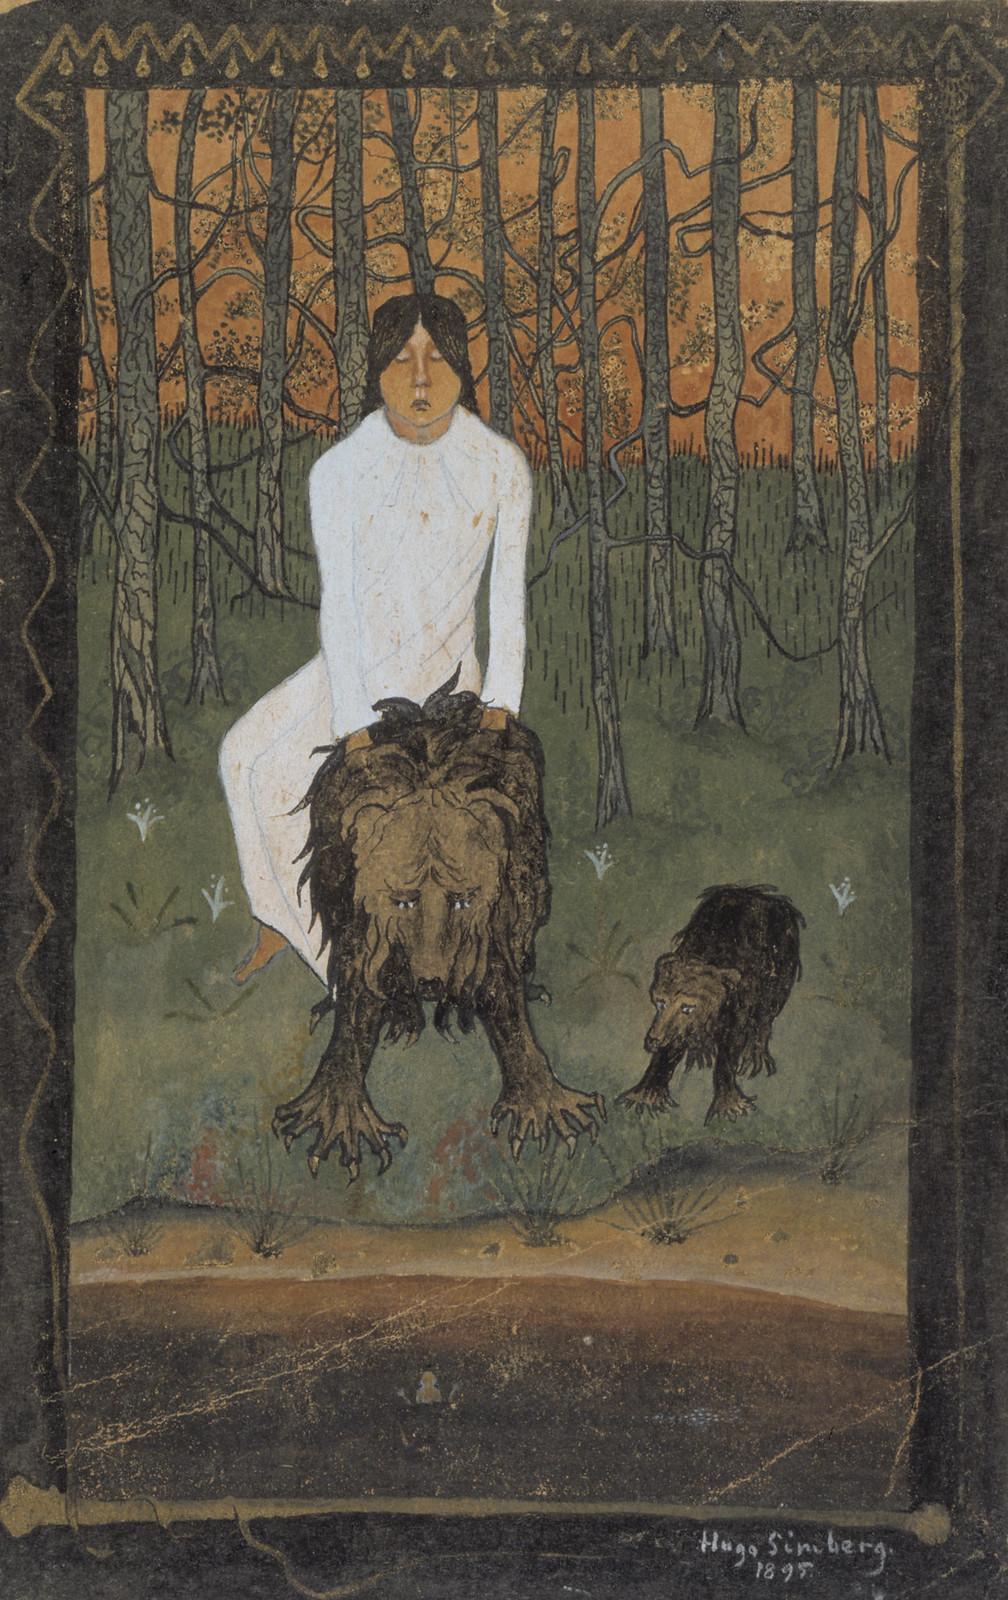 Hugo Simberg - Fairy Tale 1, 1895